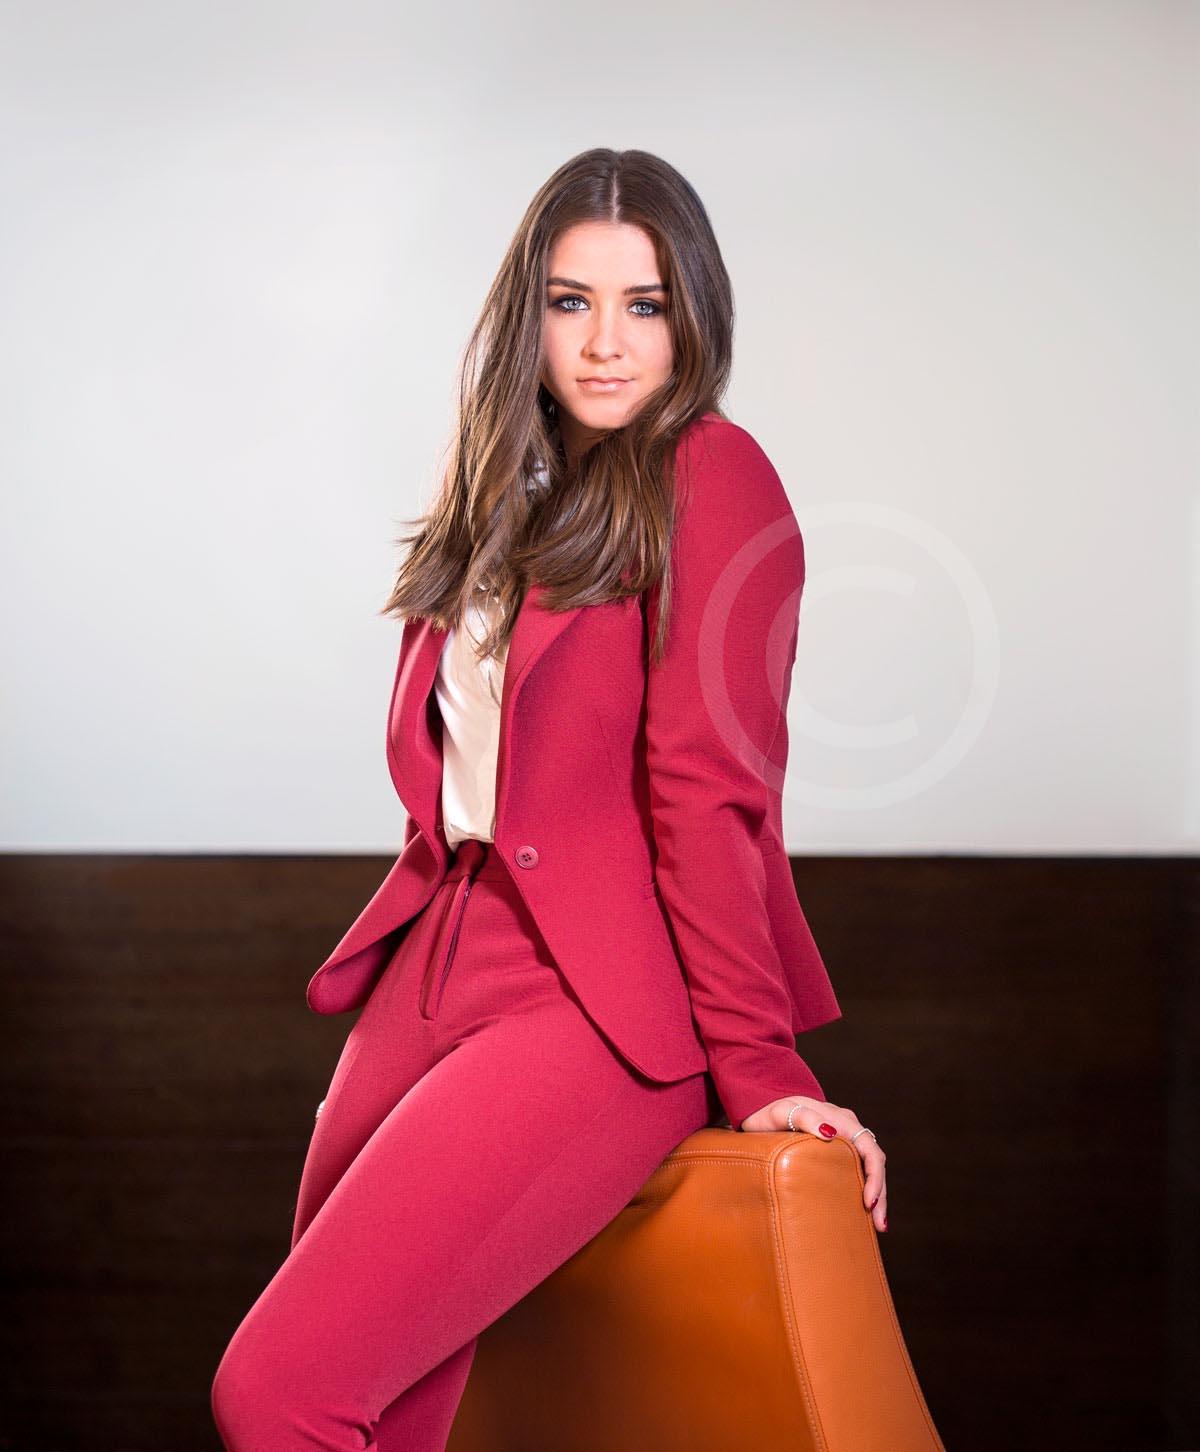 brookvincent-celebrity-photography-manchester-fashion-smag-editorial-magazine-9446